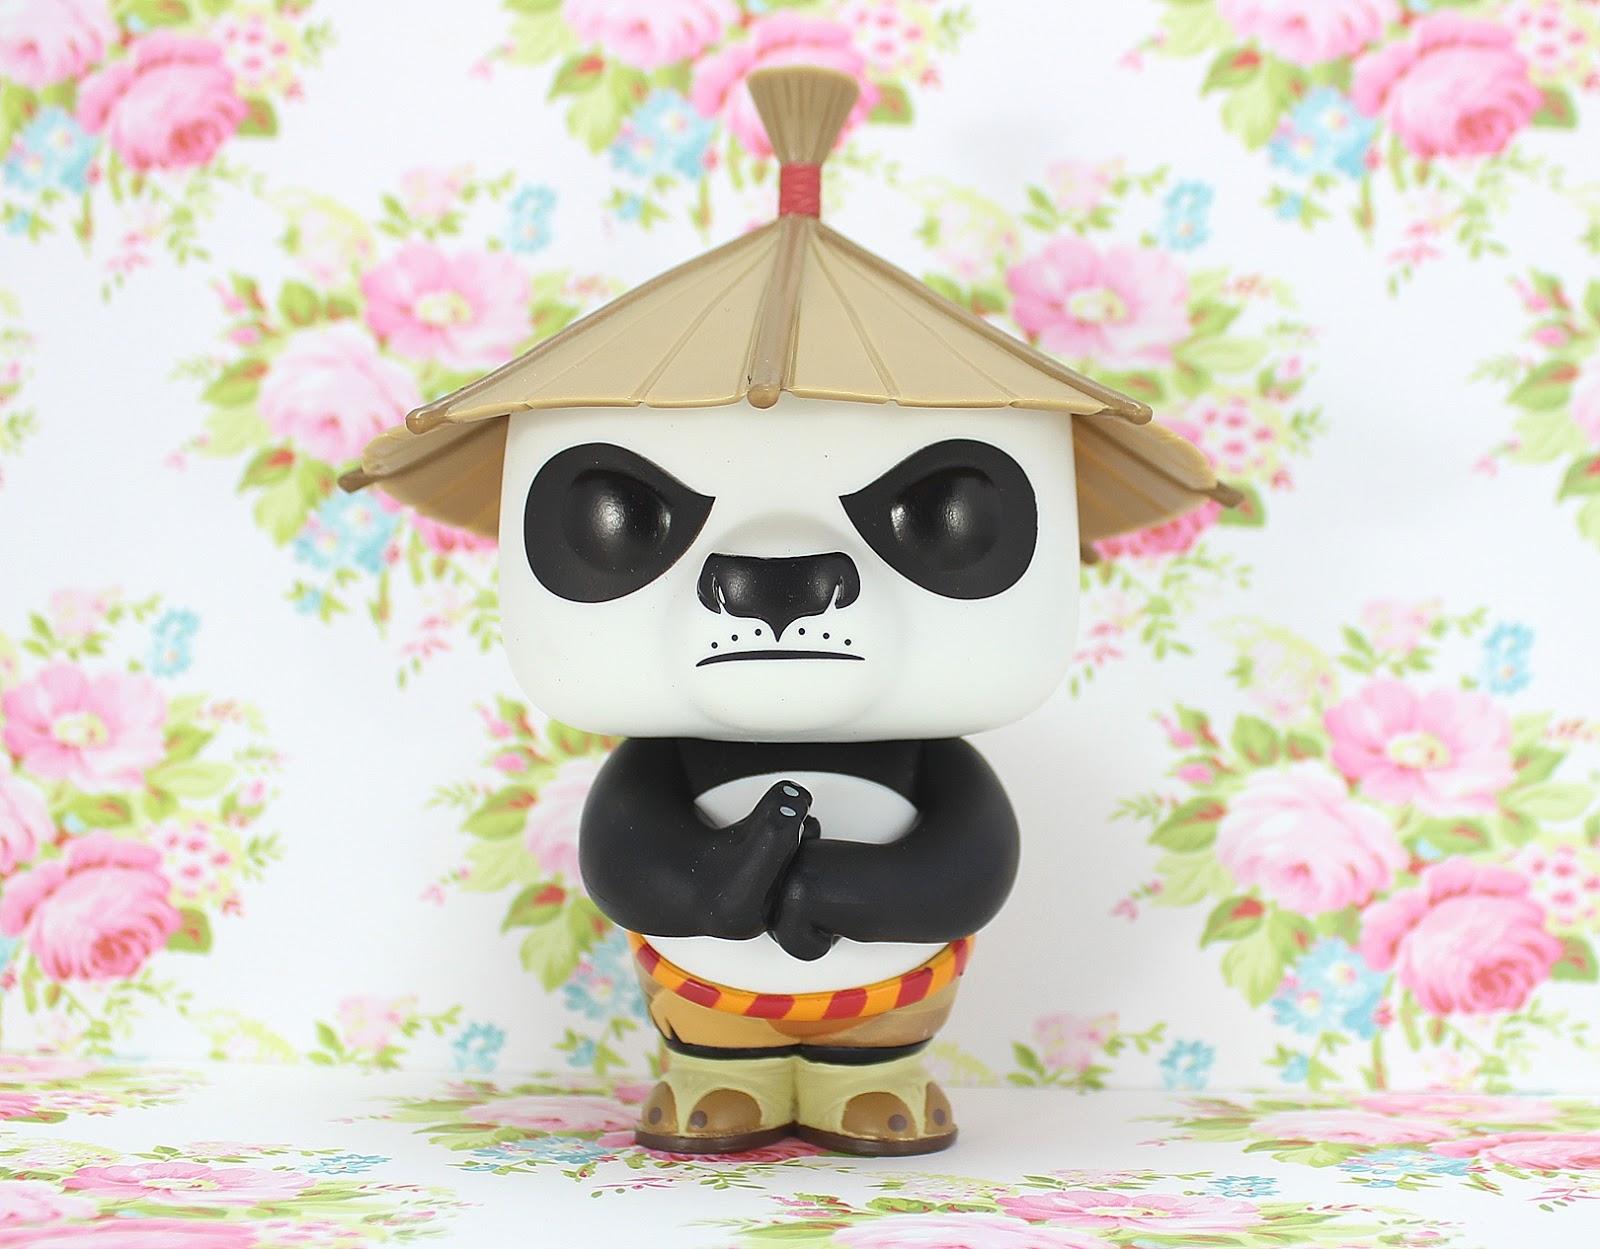 po kung fu panda funko pop